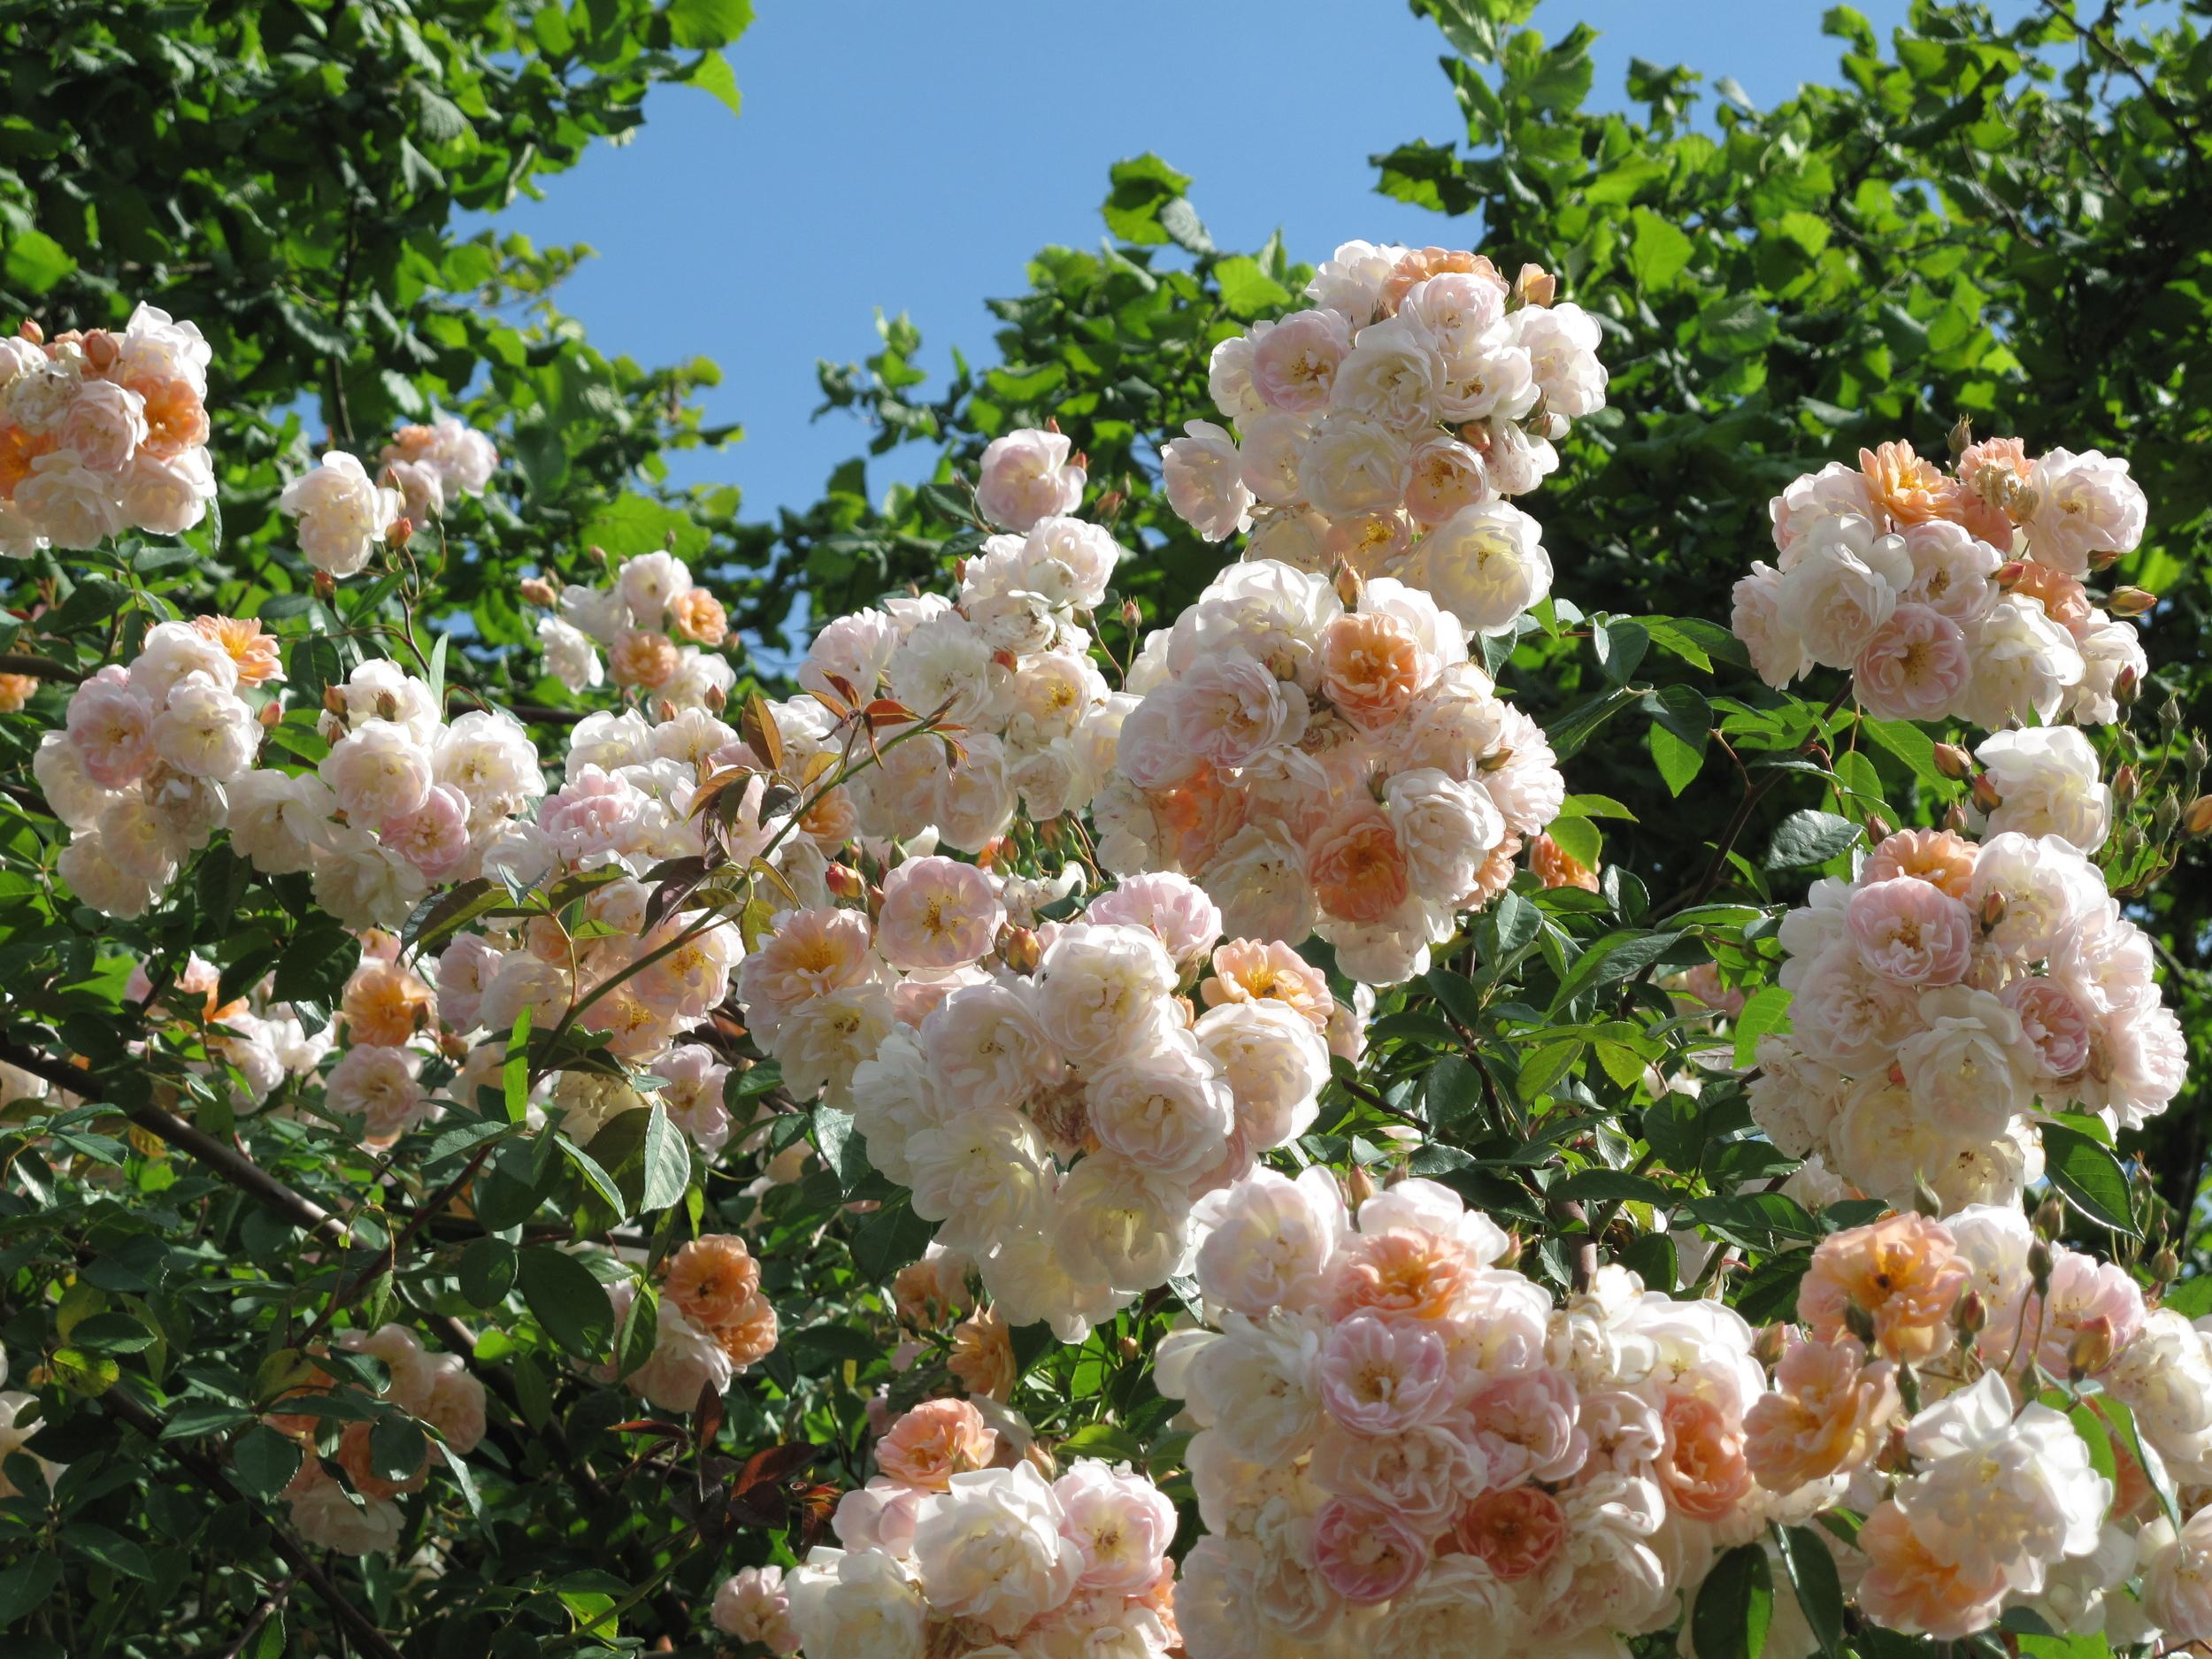 Jardin de Boissonna - rose bushes